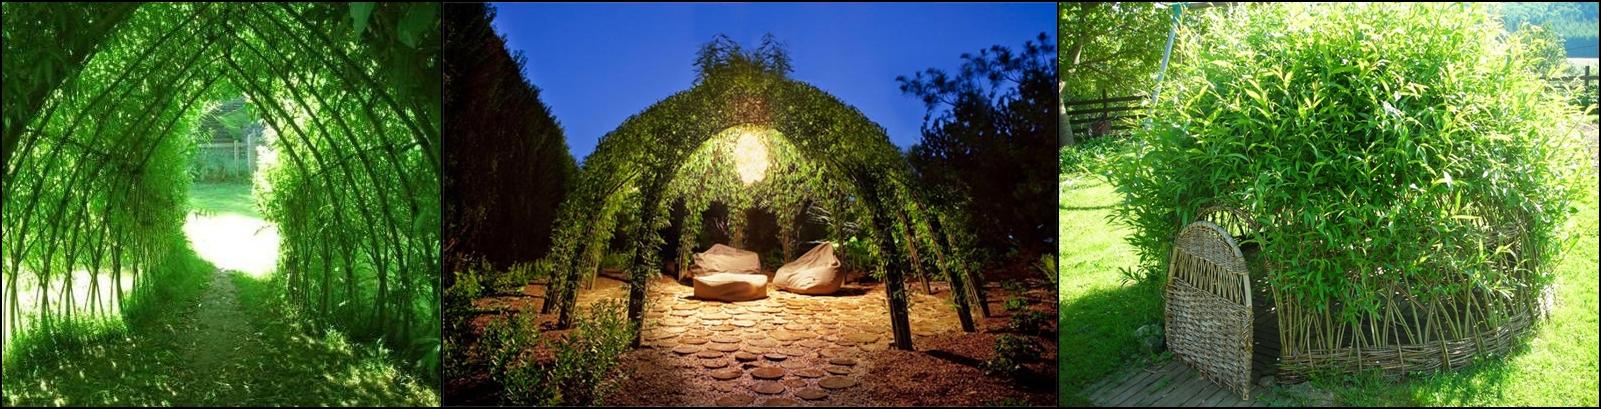 romantikus kerti